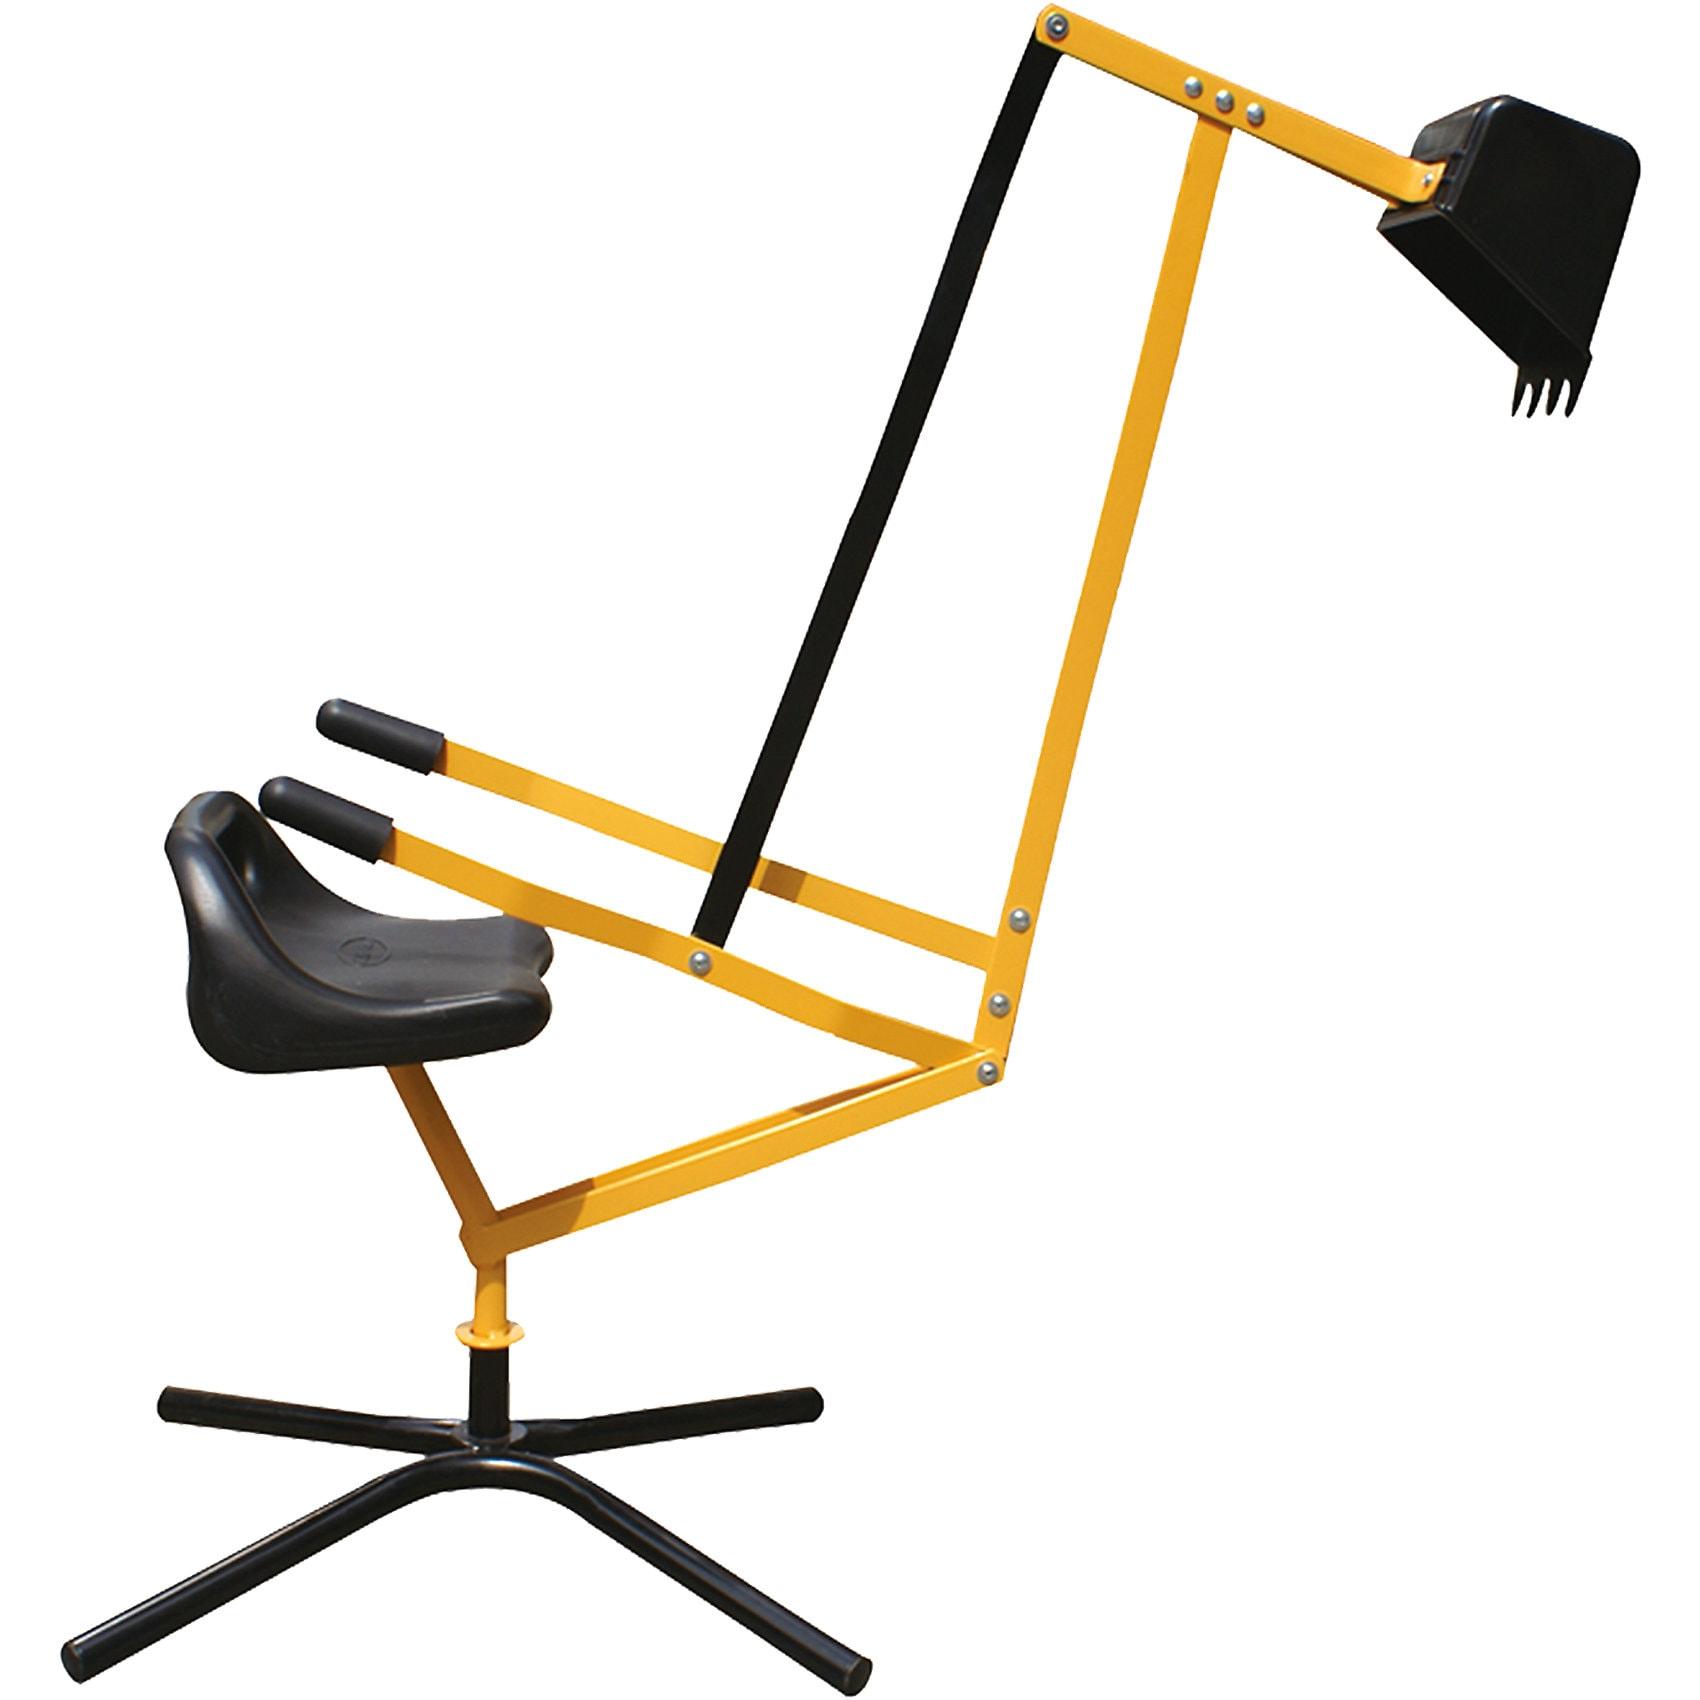 Metall-Sitzbagger